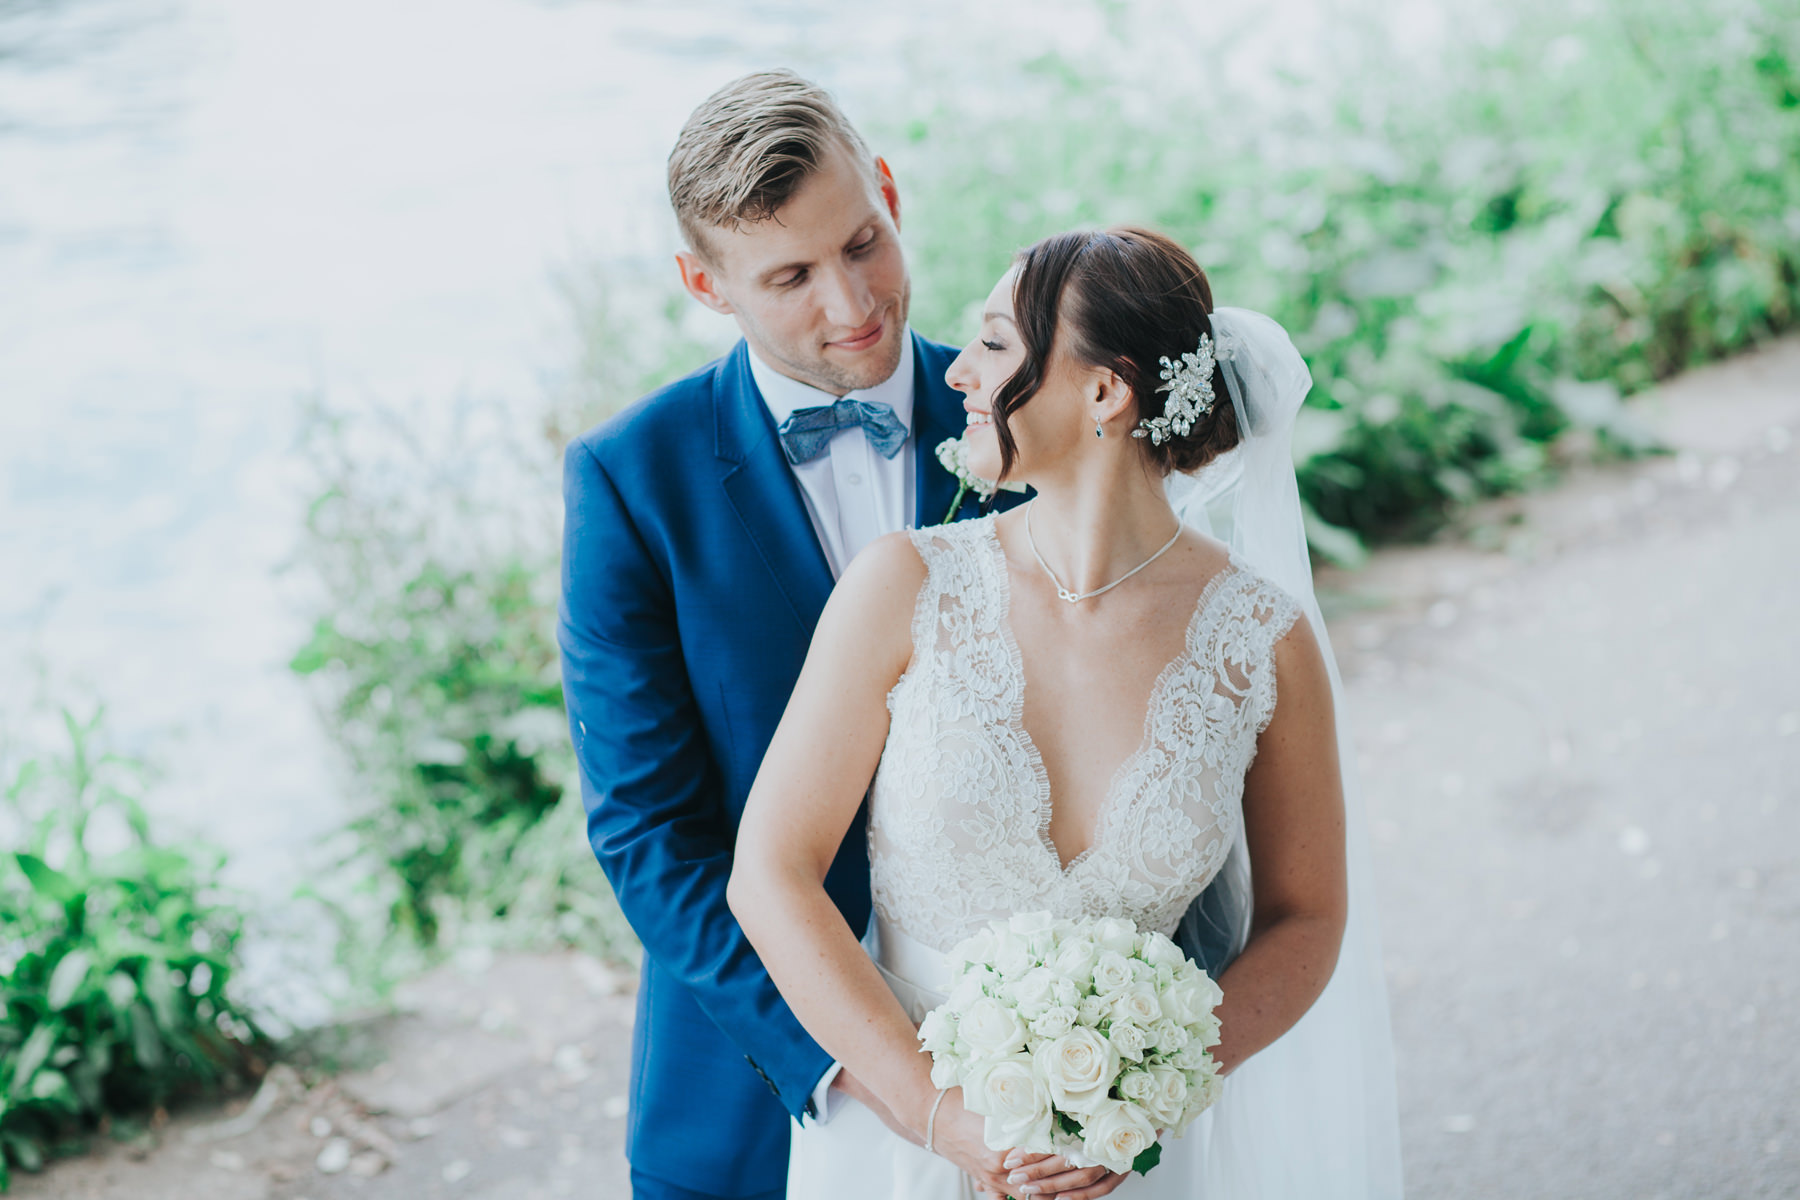 CRL-417-The Bingham wedding Richmond-Claire Rob bridal couple portraits on Thamespath.jpg